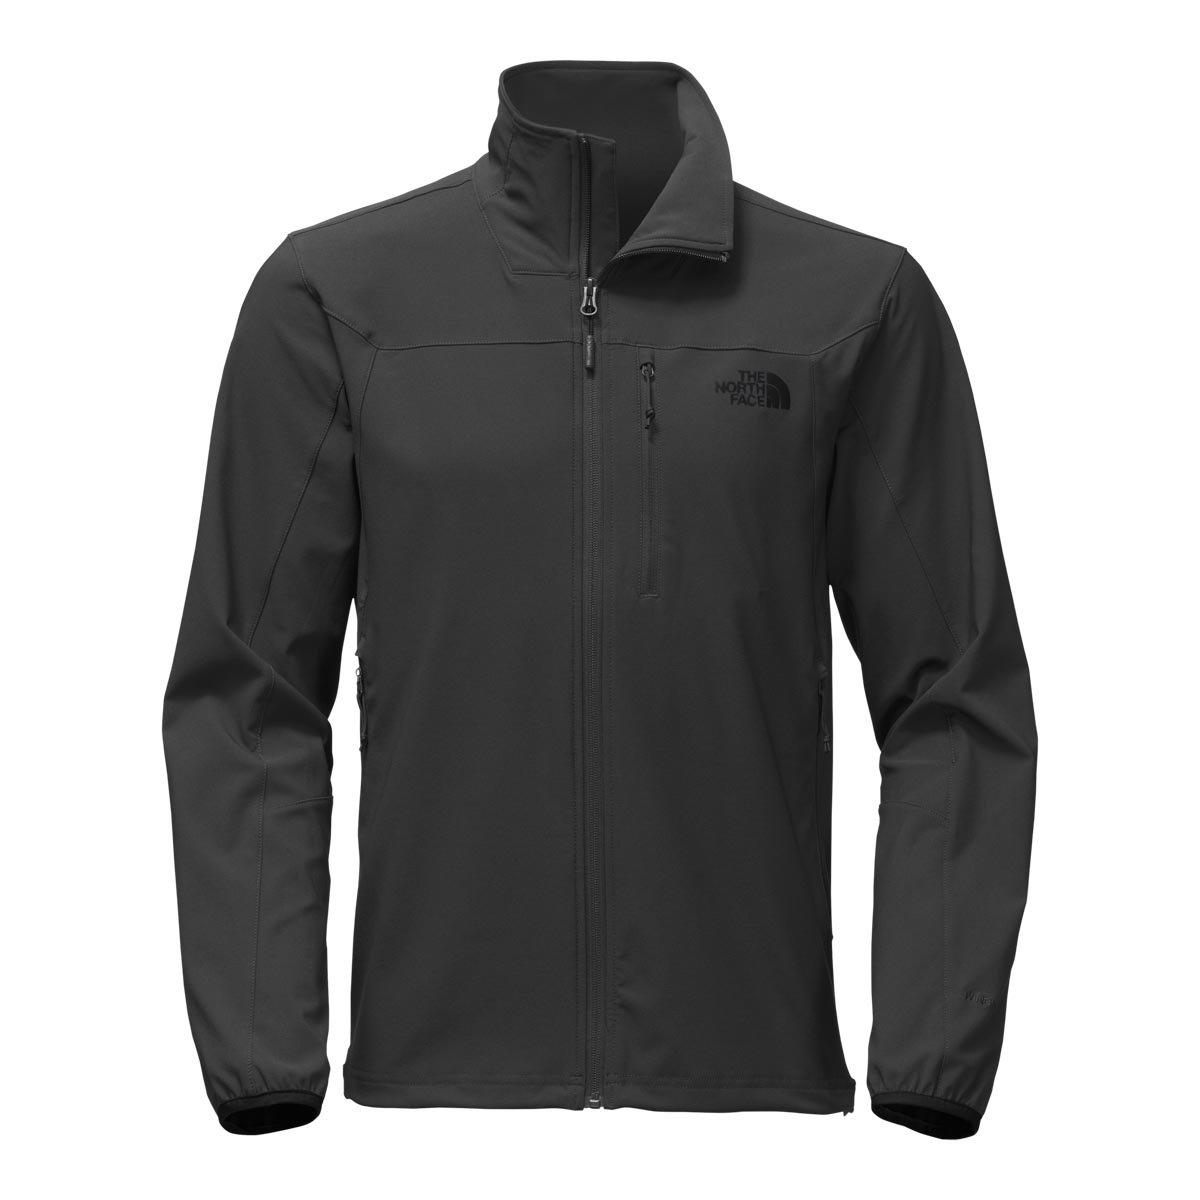 The North Face Men's Apex Nimble Jacket Asphalt Grey - XL by The North Face (Image #1)